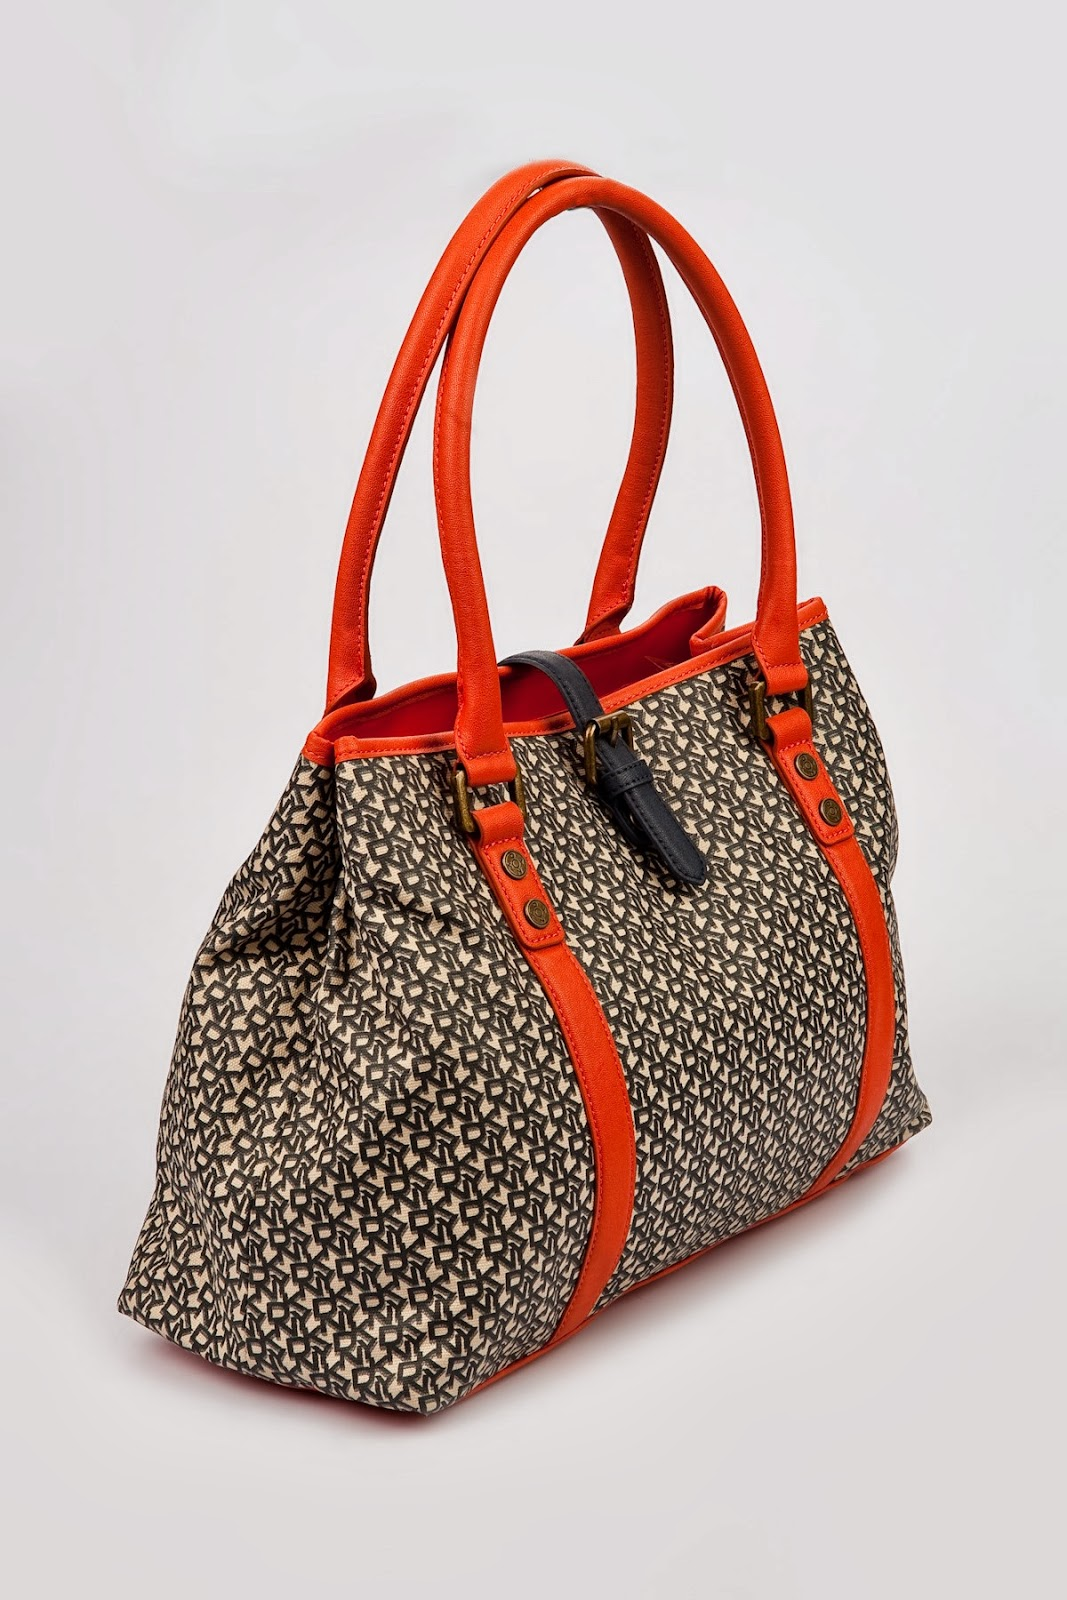 Bag At You Fashion Blog Hip E Bags White Backpack: DKNY Spring Summer 2014 Handbags Models,KNY Bags,DKNY